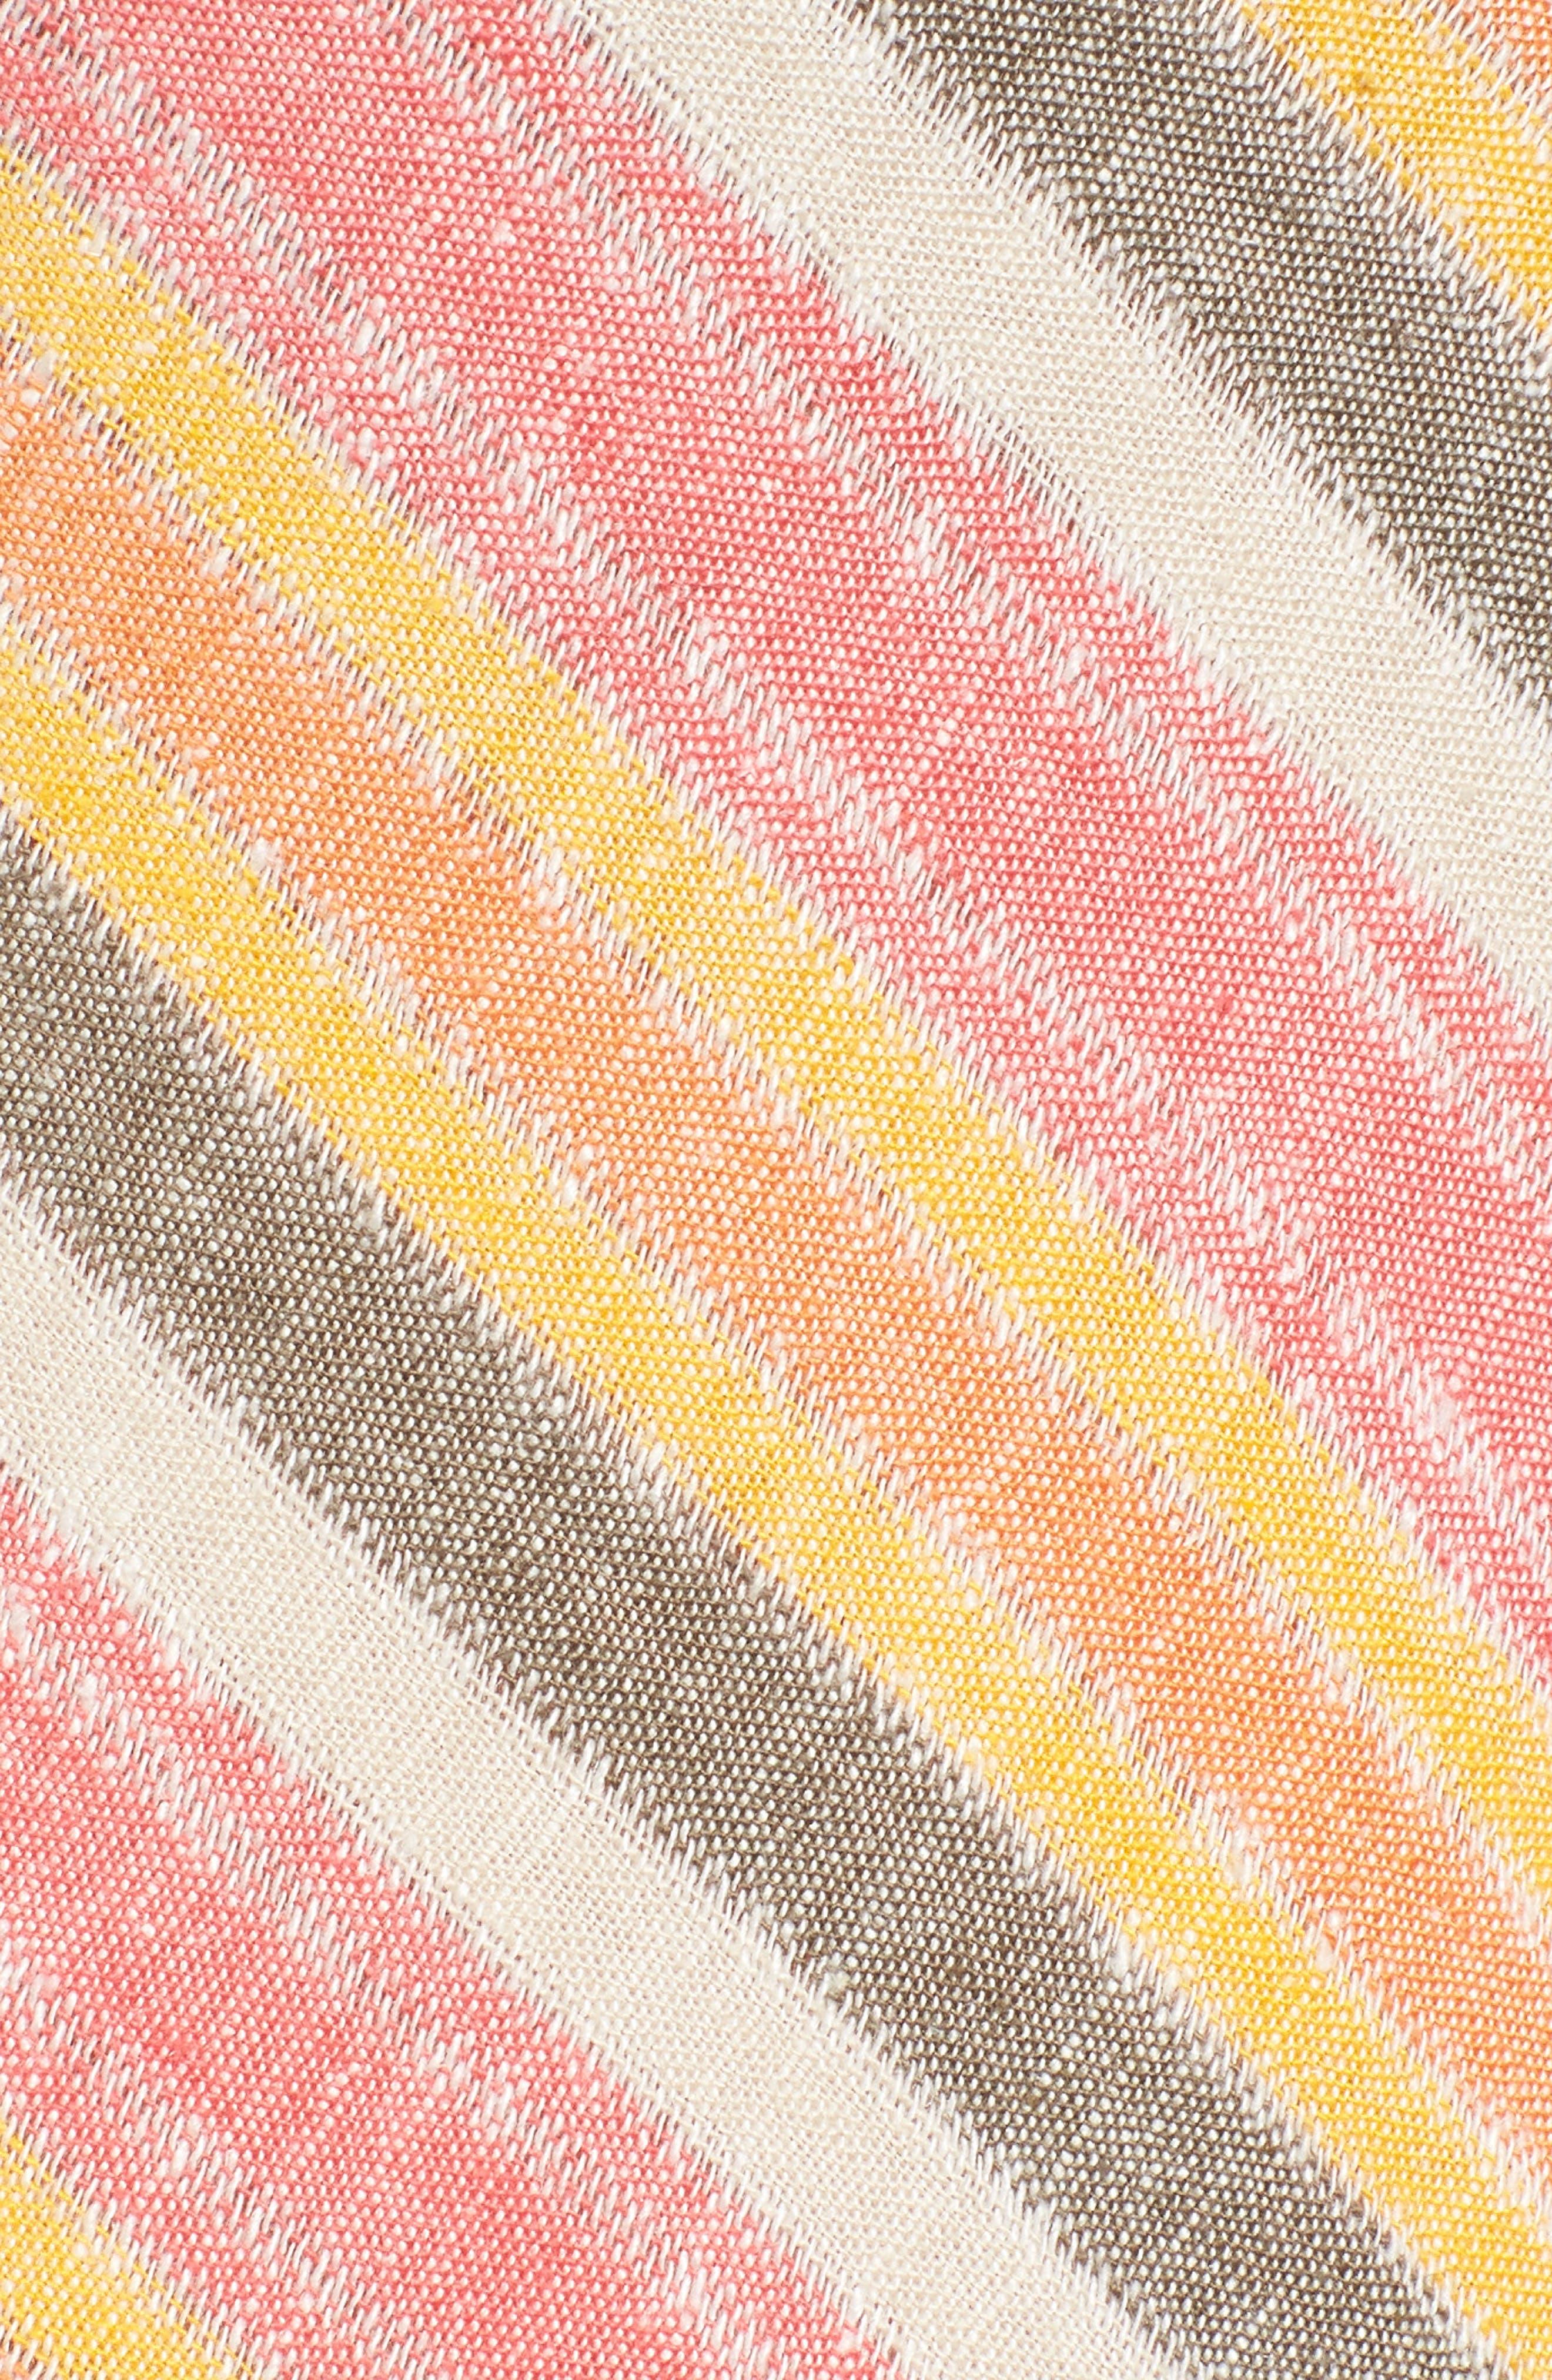 Stripe A-Line Maxi Dress,                             Alternate thumbnail 6, color,                             Coral Erin Stripe